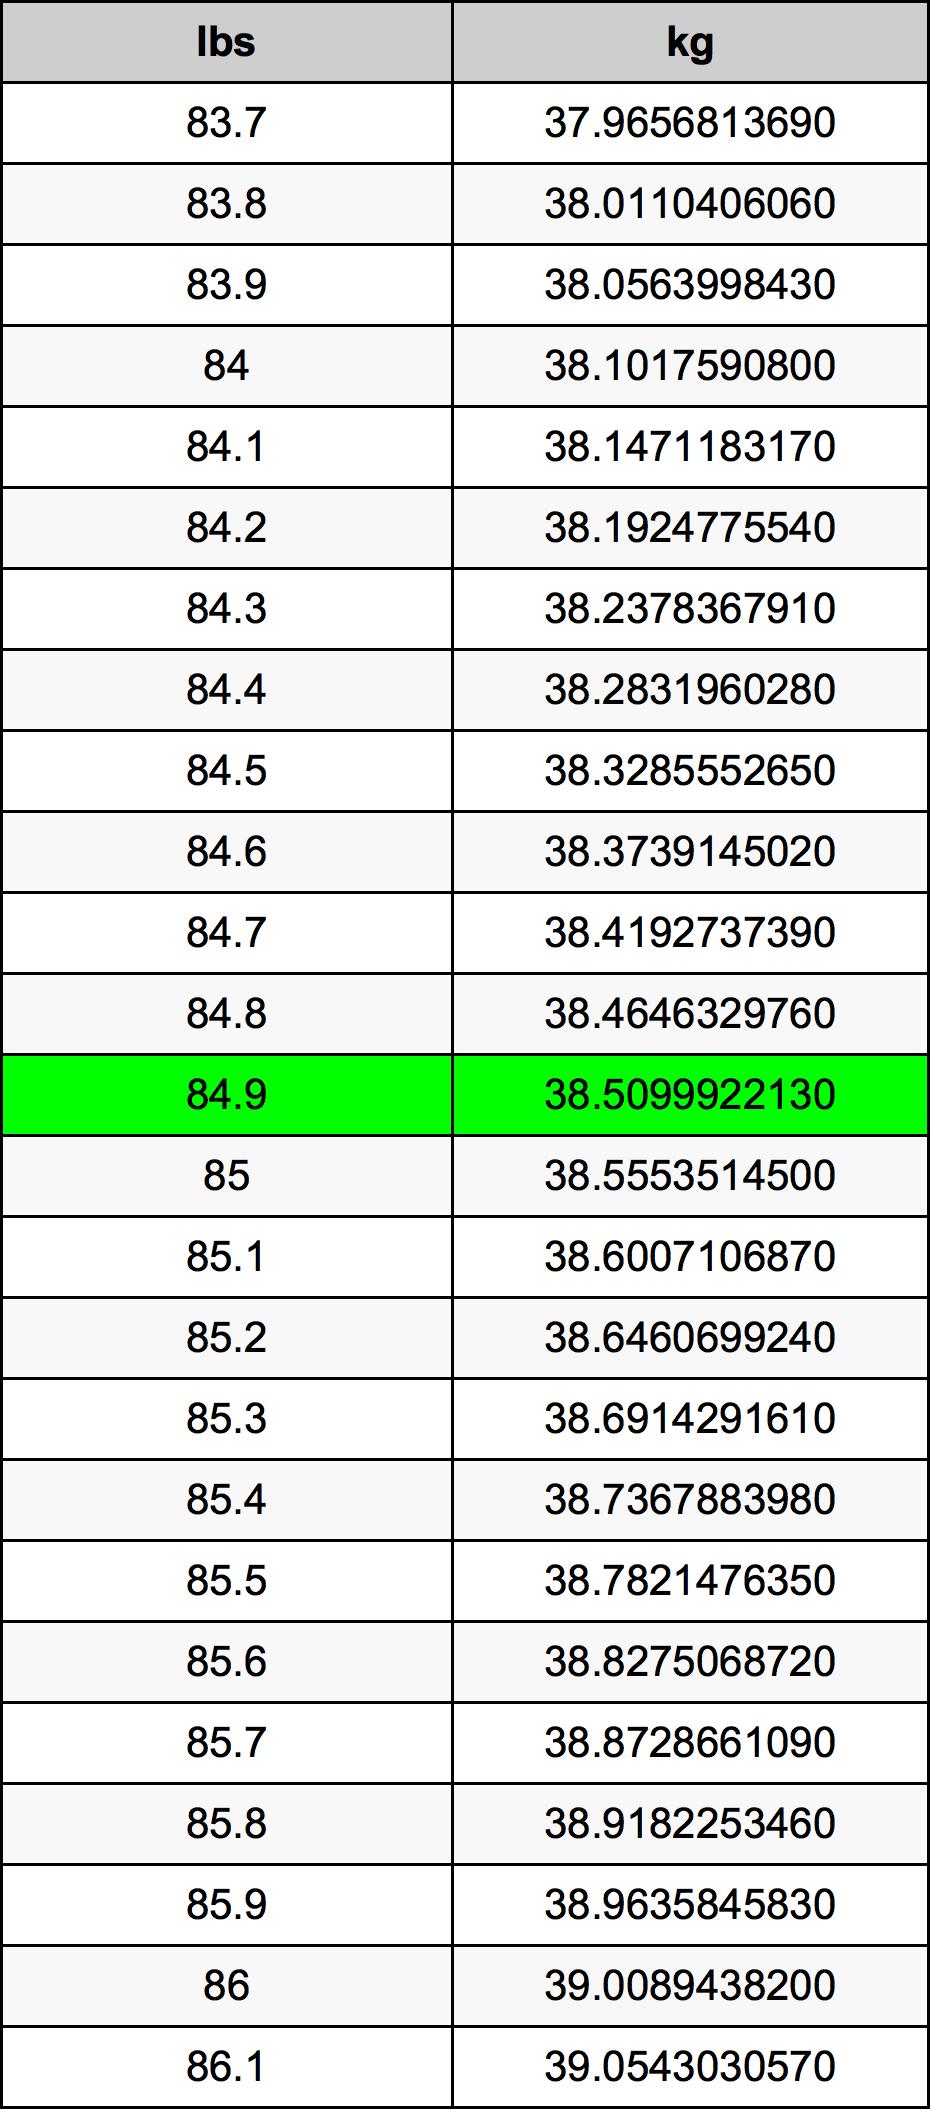 84.9 Libra konverteringstabellen